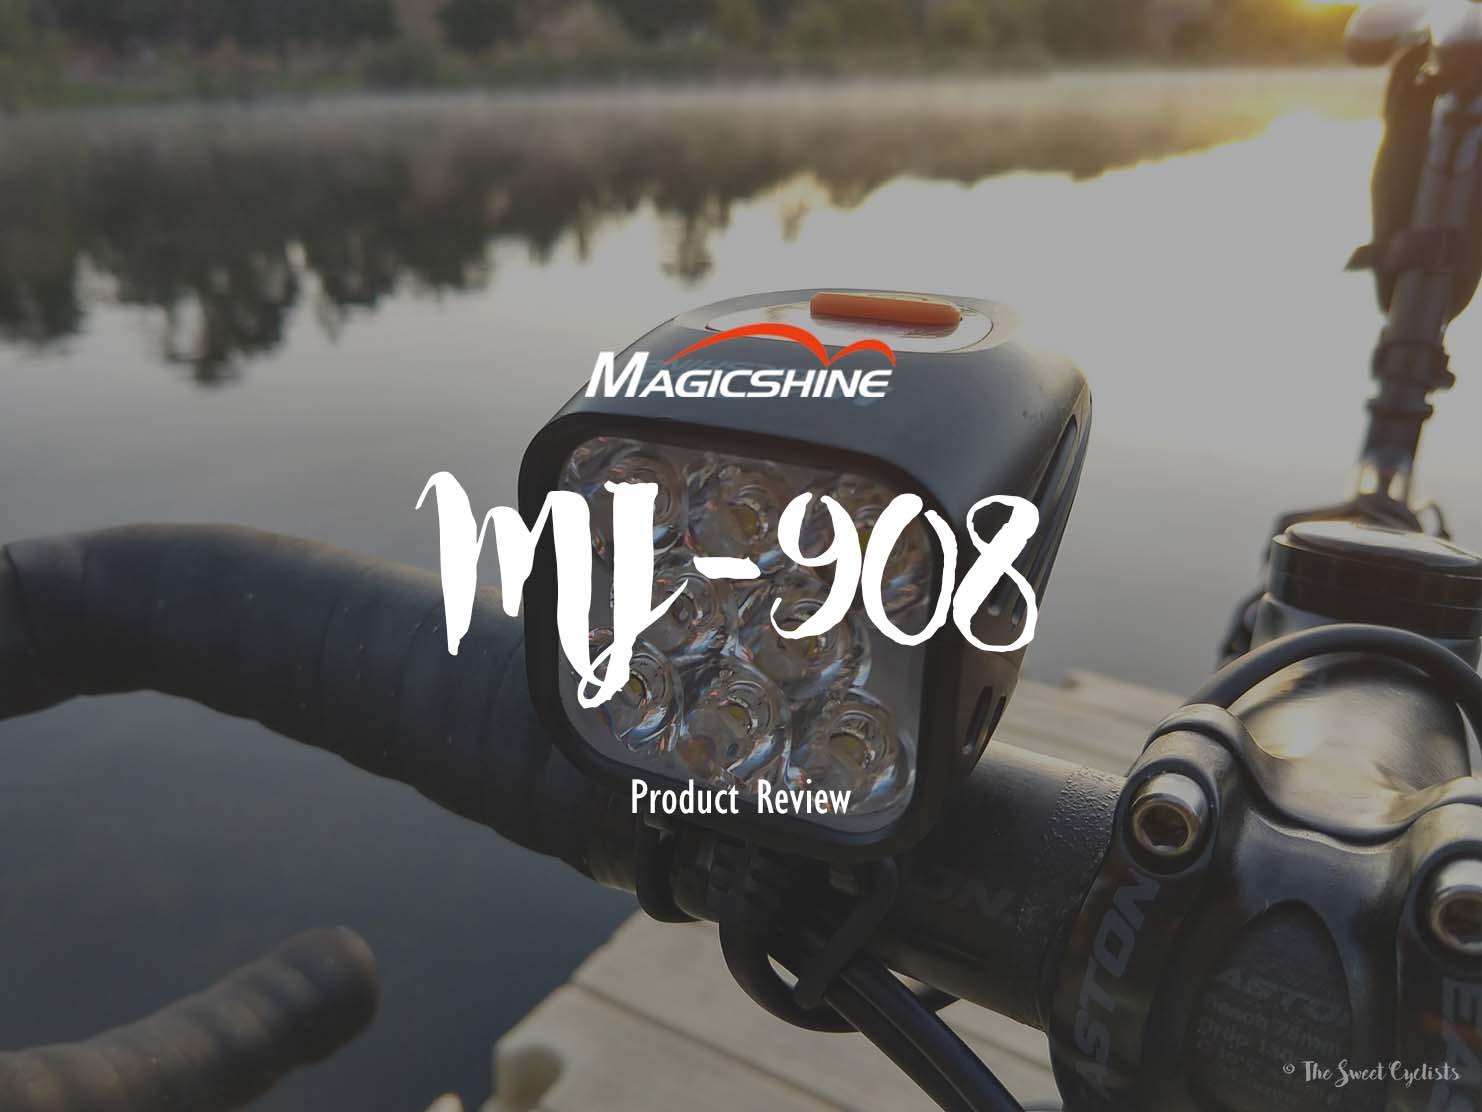 Magicshine  MJ-908, an absurdly bright bike light